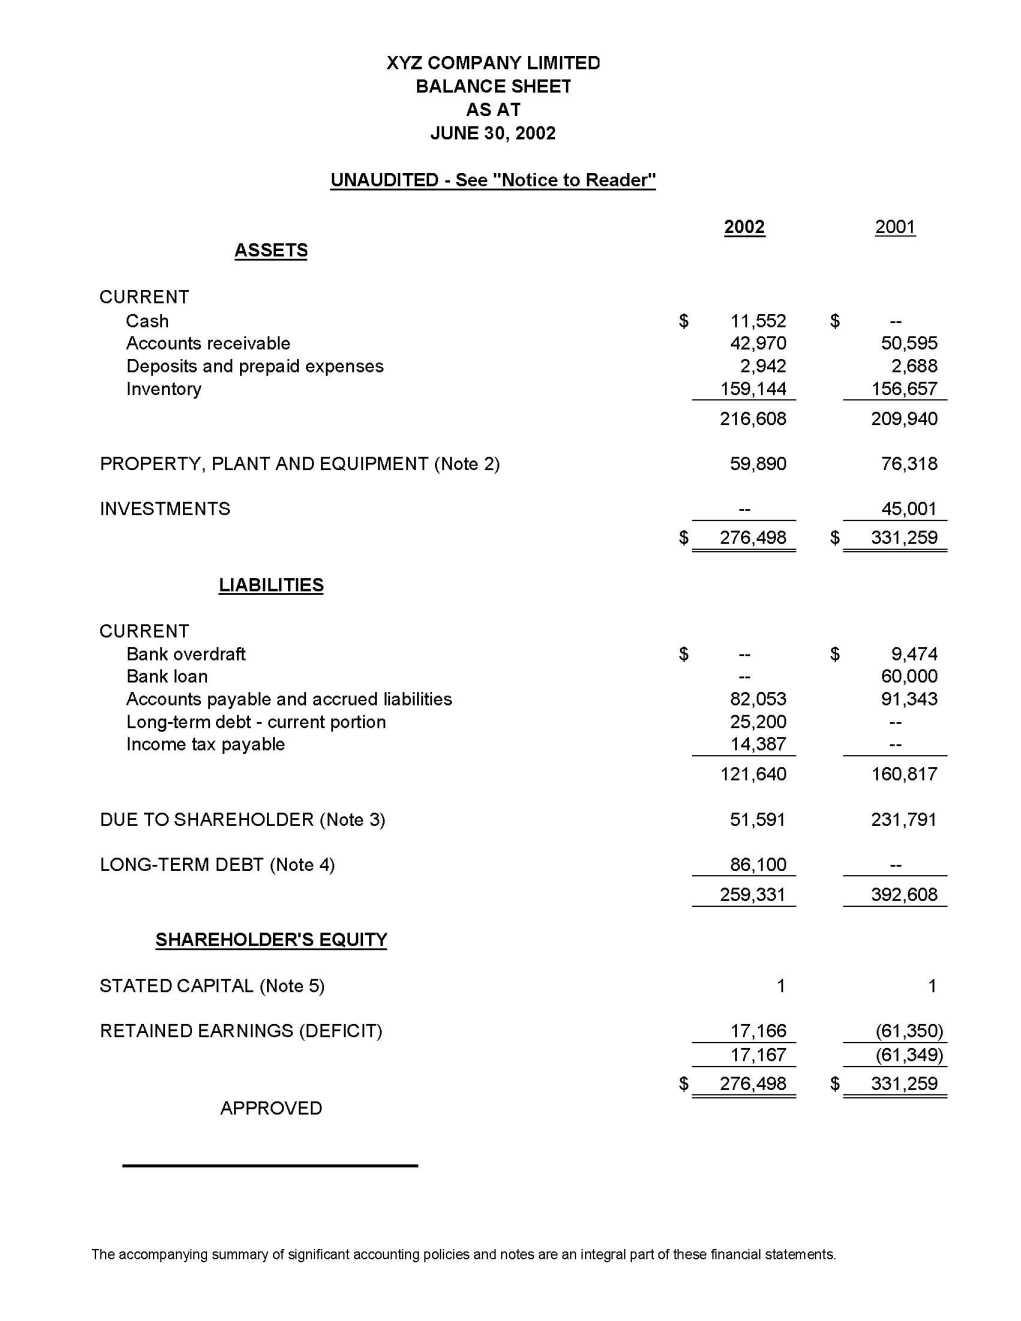 Douglas A Boufford Ca Understanding Financial Statements